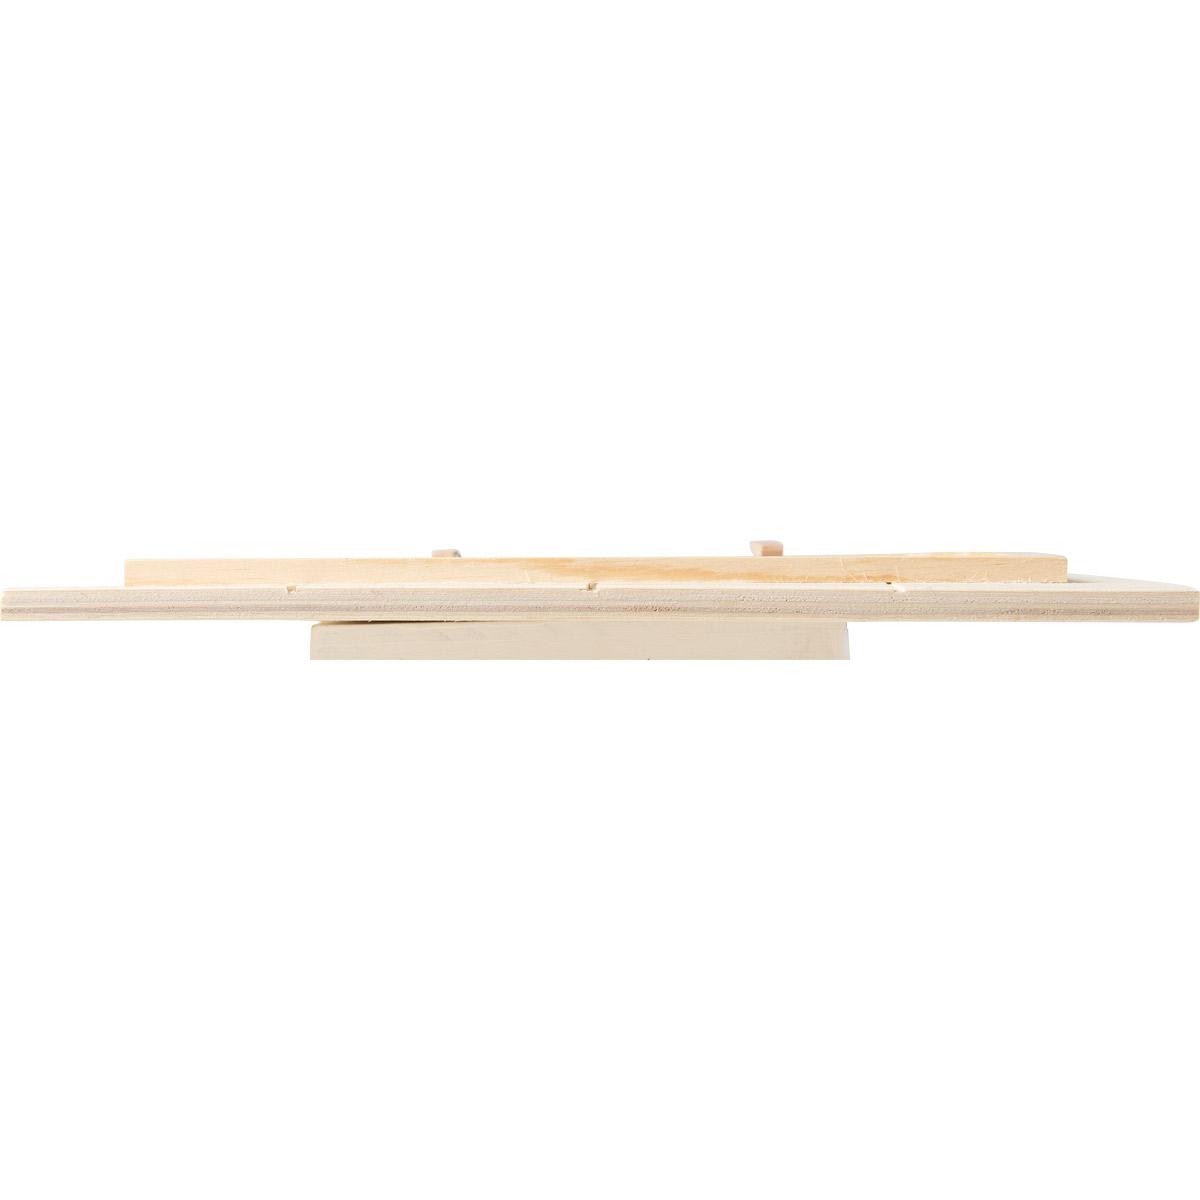 Plaid ® Wood Surfaces - Pallet Sign, 10.25